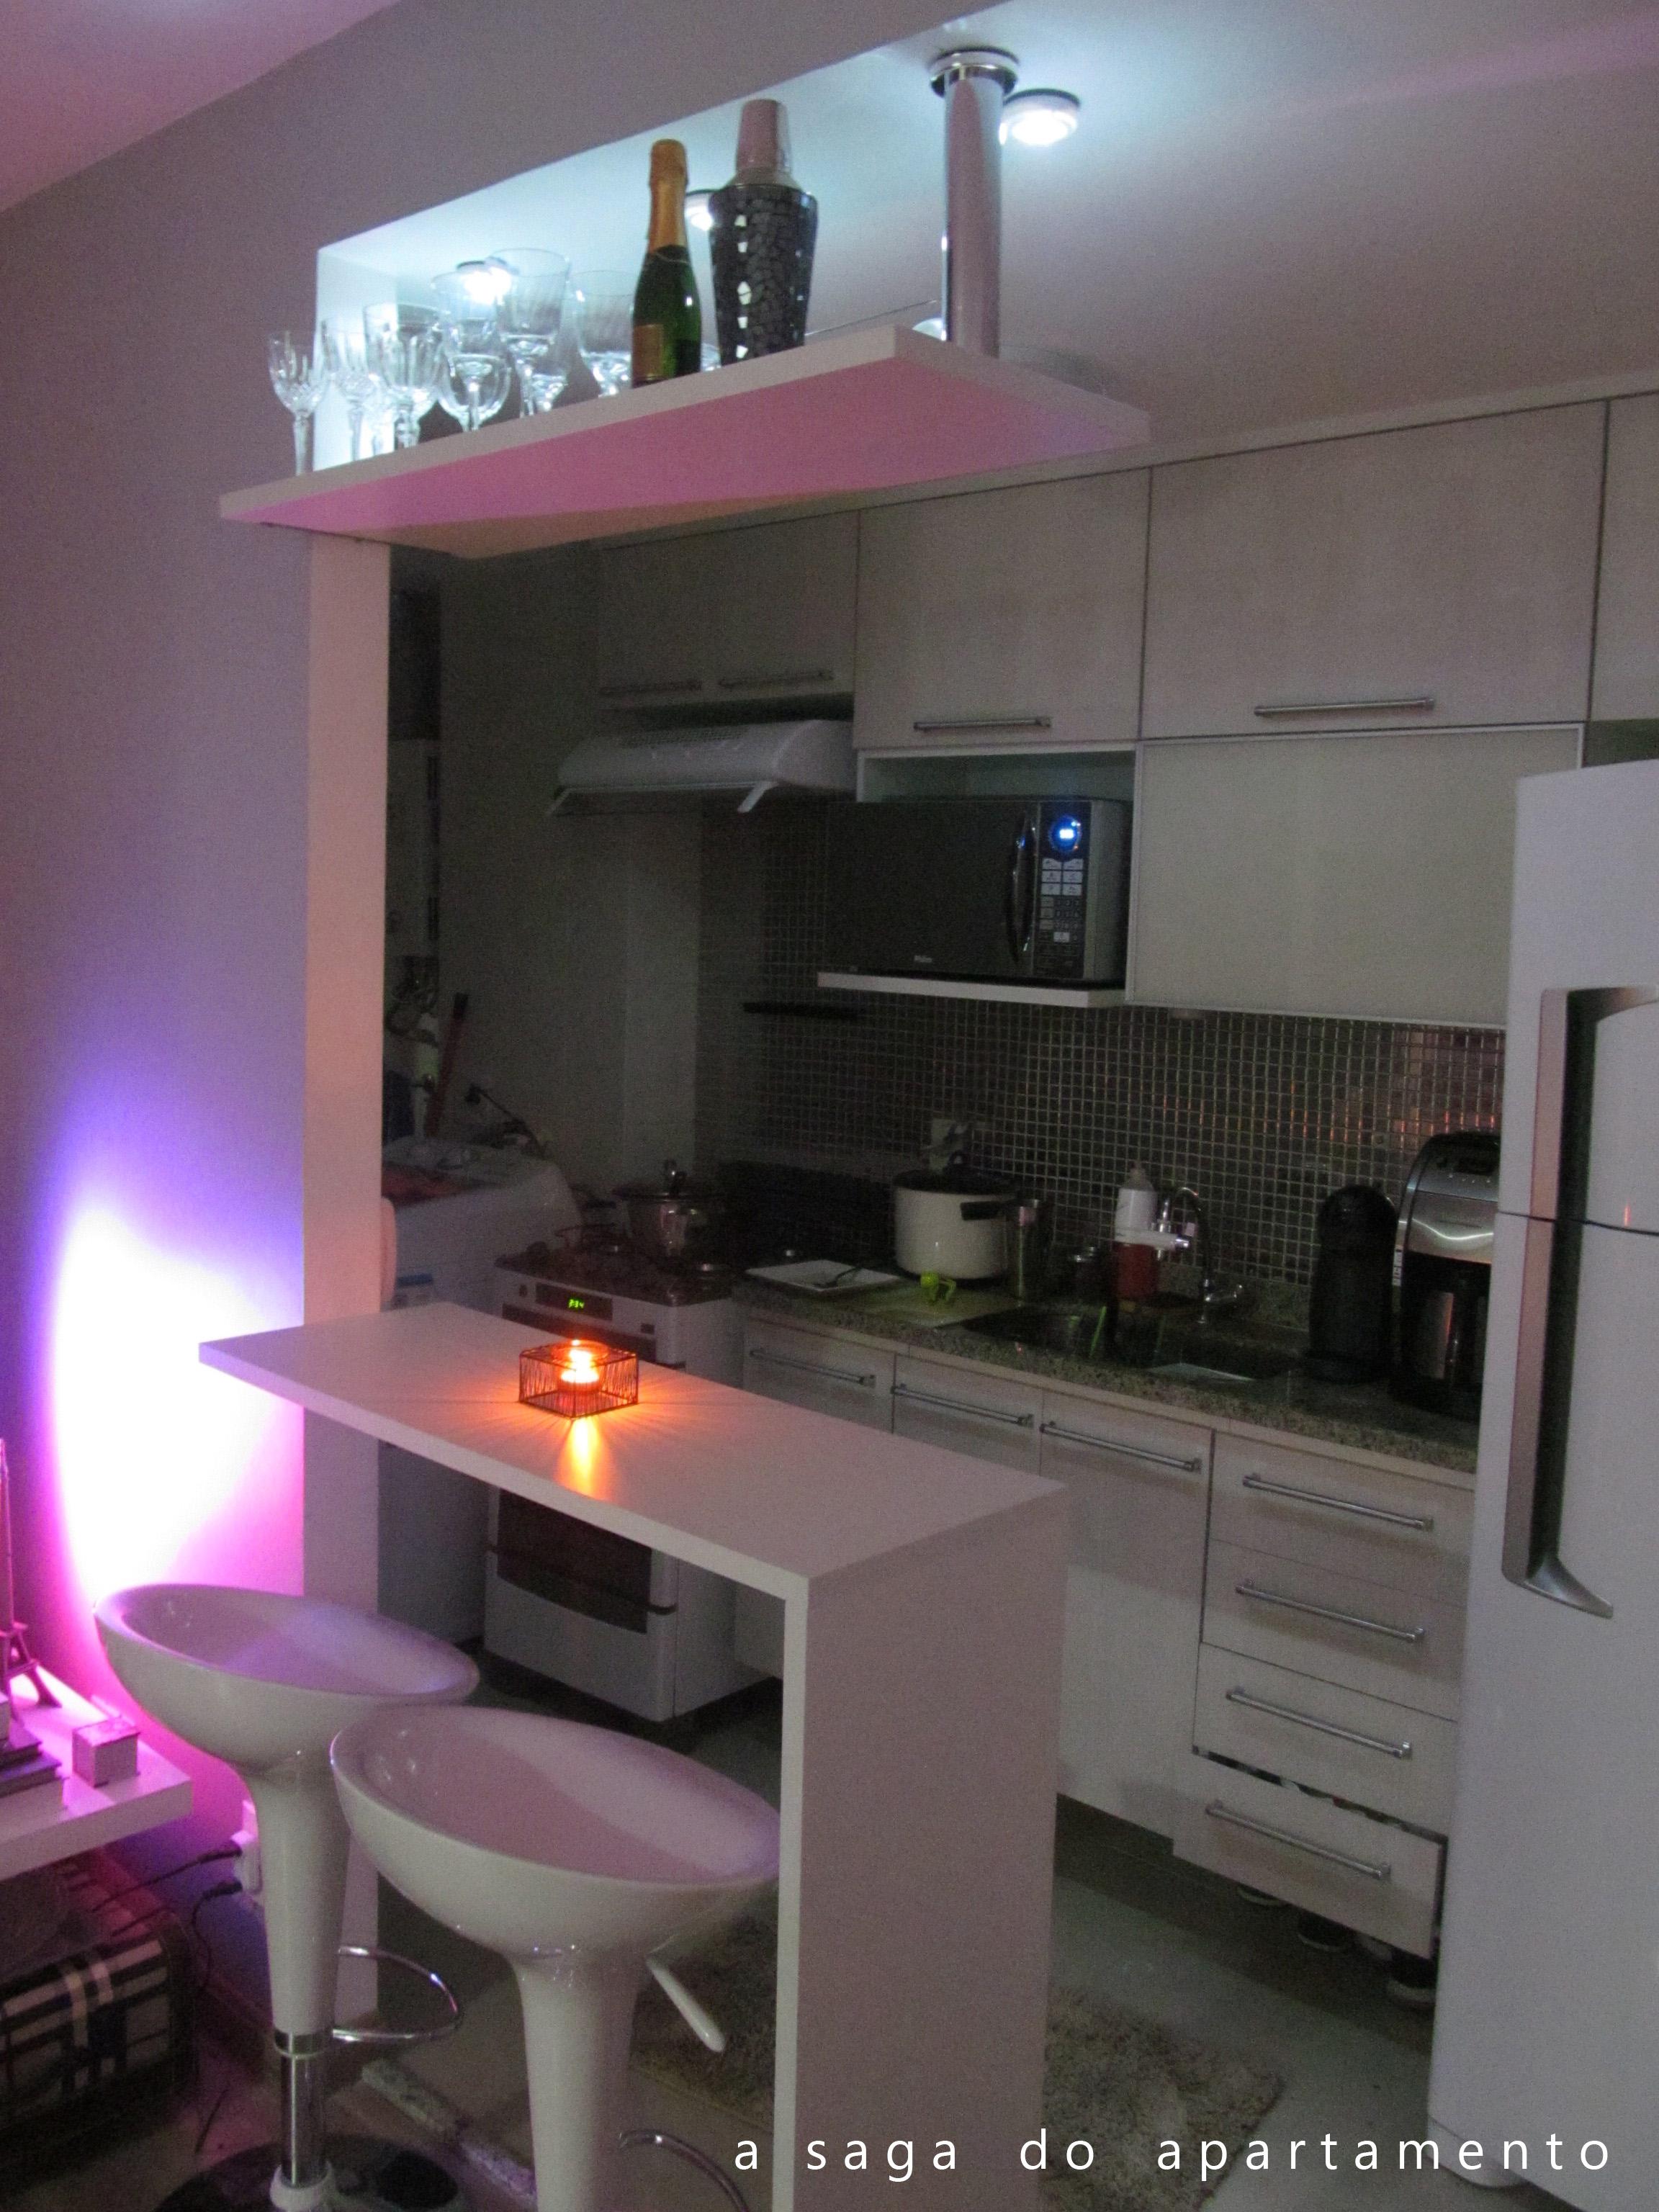 bancada cozinha italinea #921AB1 2304 3072